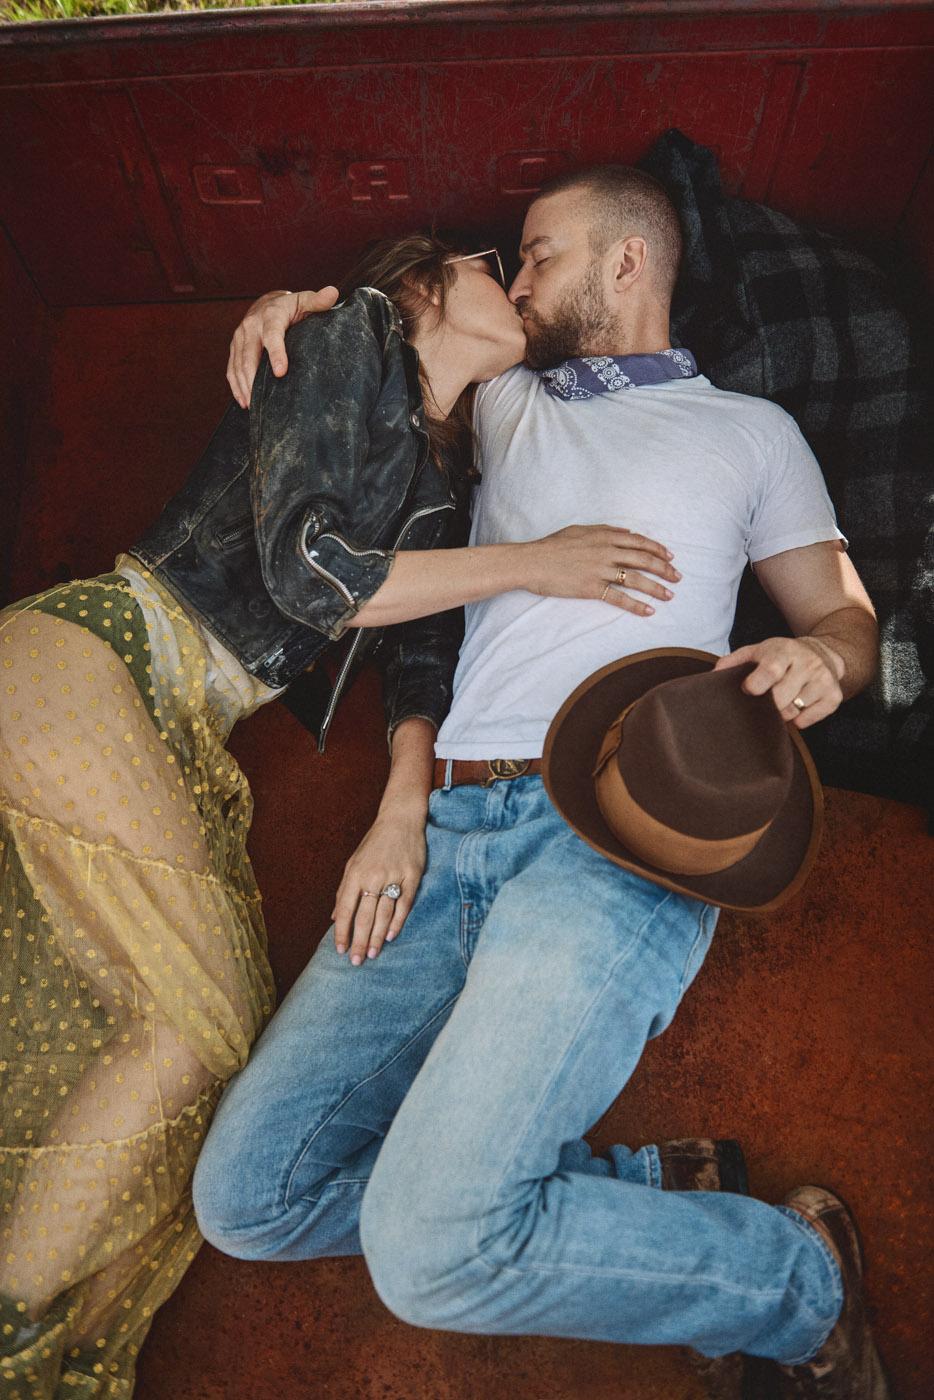 Jessica Biel & Justin Timberlake, Man of the Woods Album, February 2, 2018.